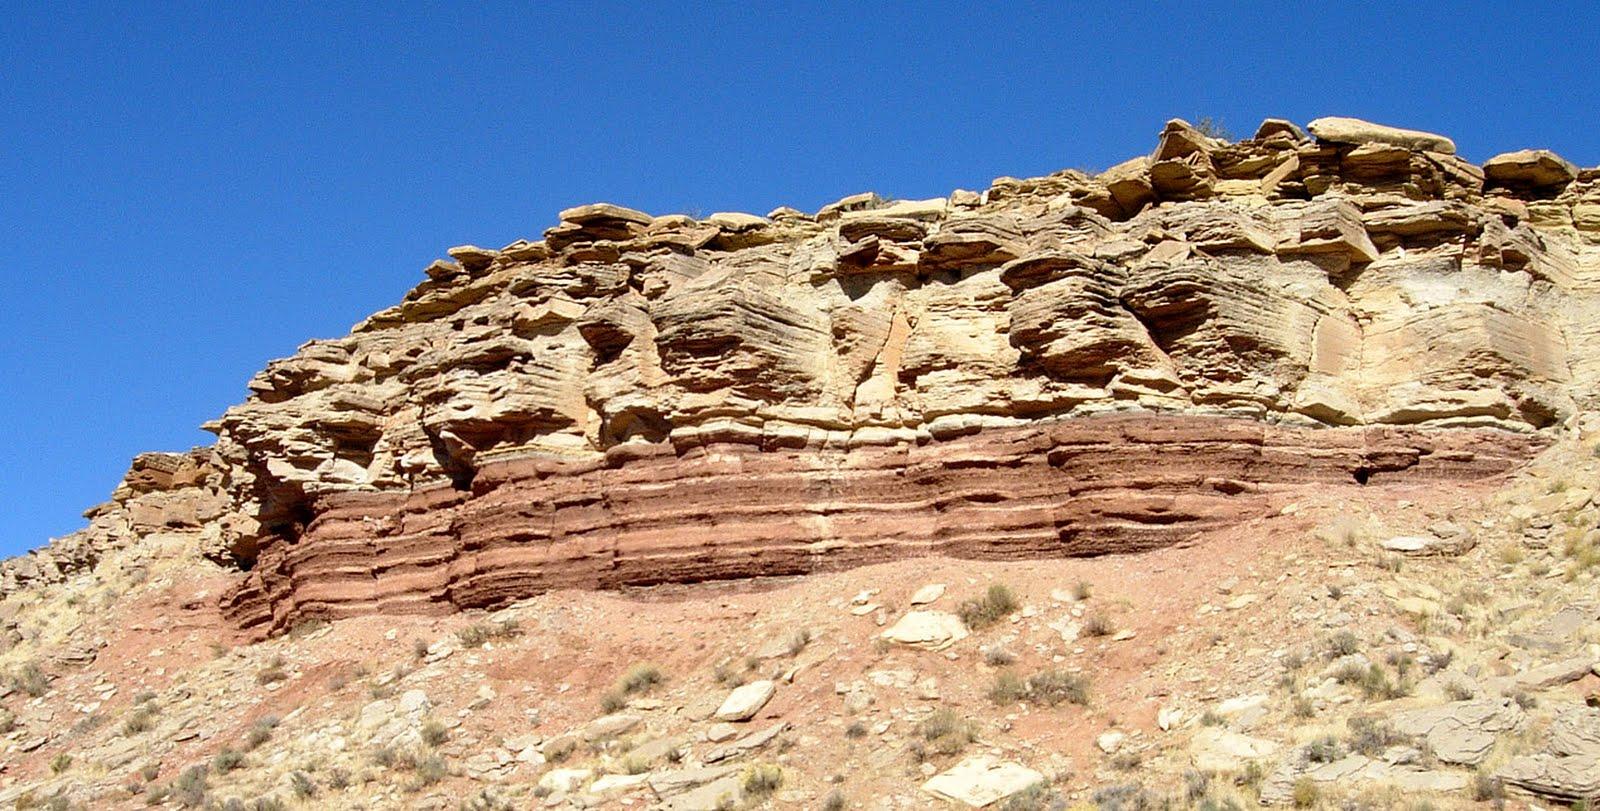 Caol clipart sedimentary rock Wednesday and January Domain Clip